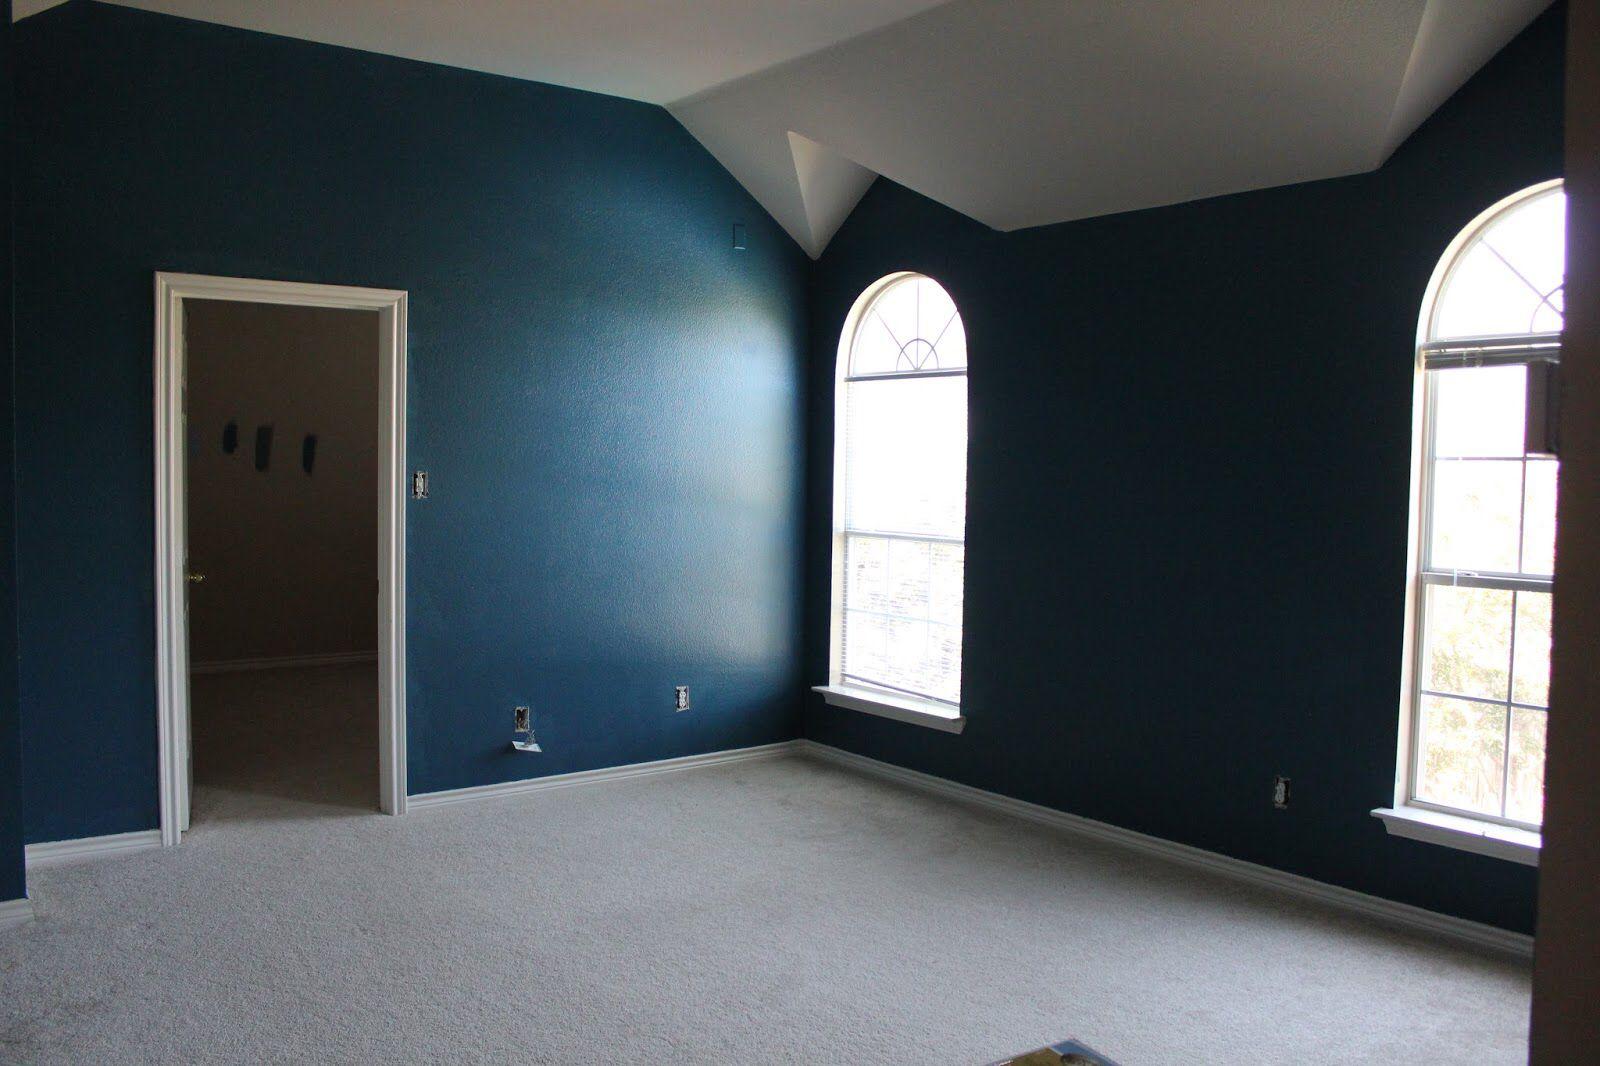 Behr Bermudan Blue Inspiration For Bedroom Color Scheme